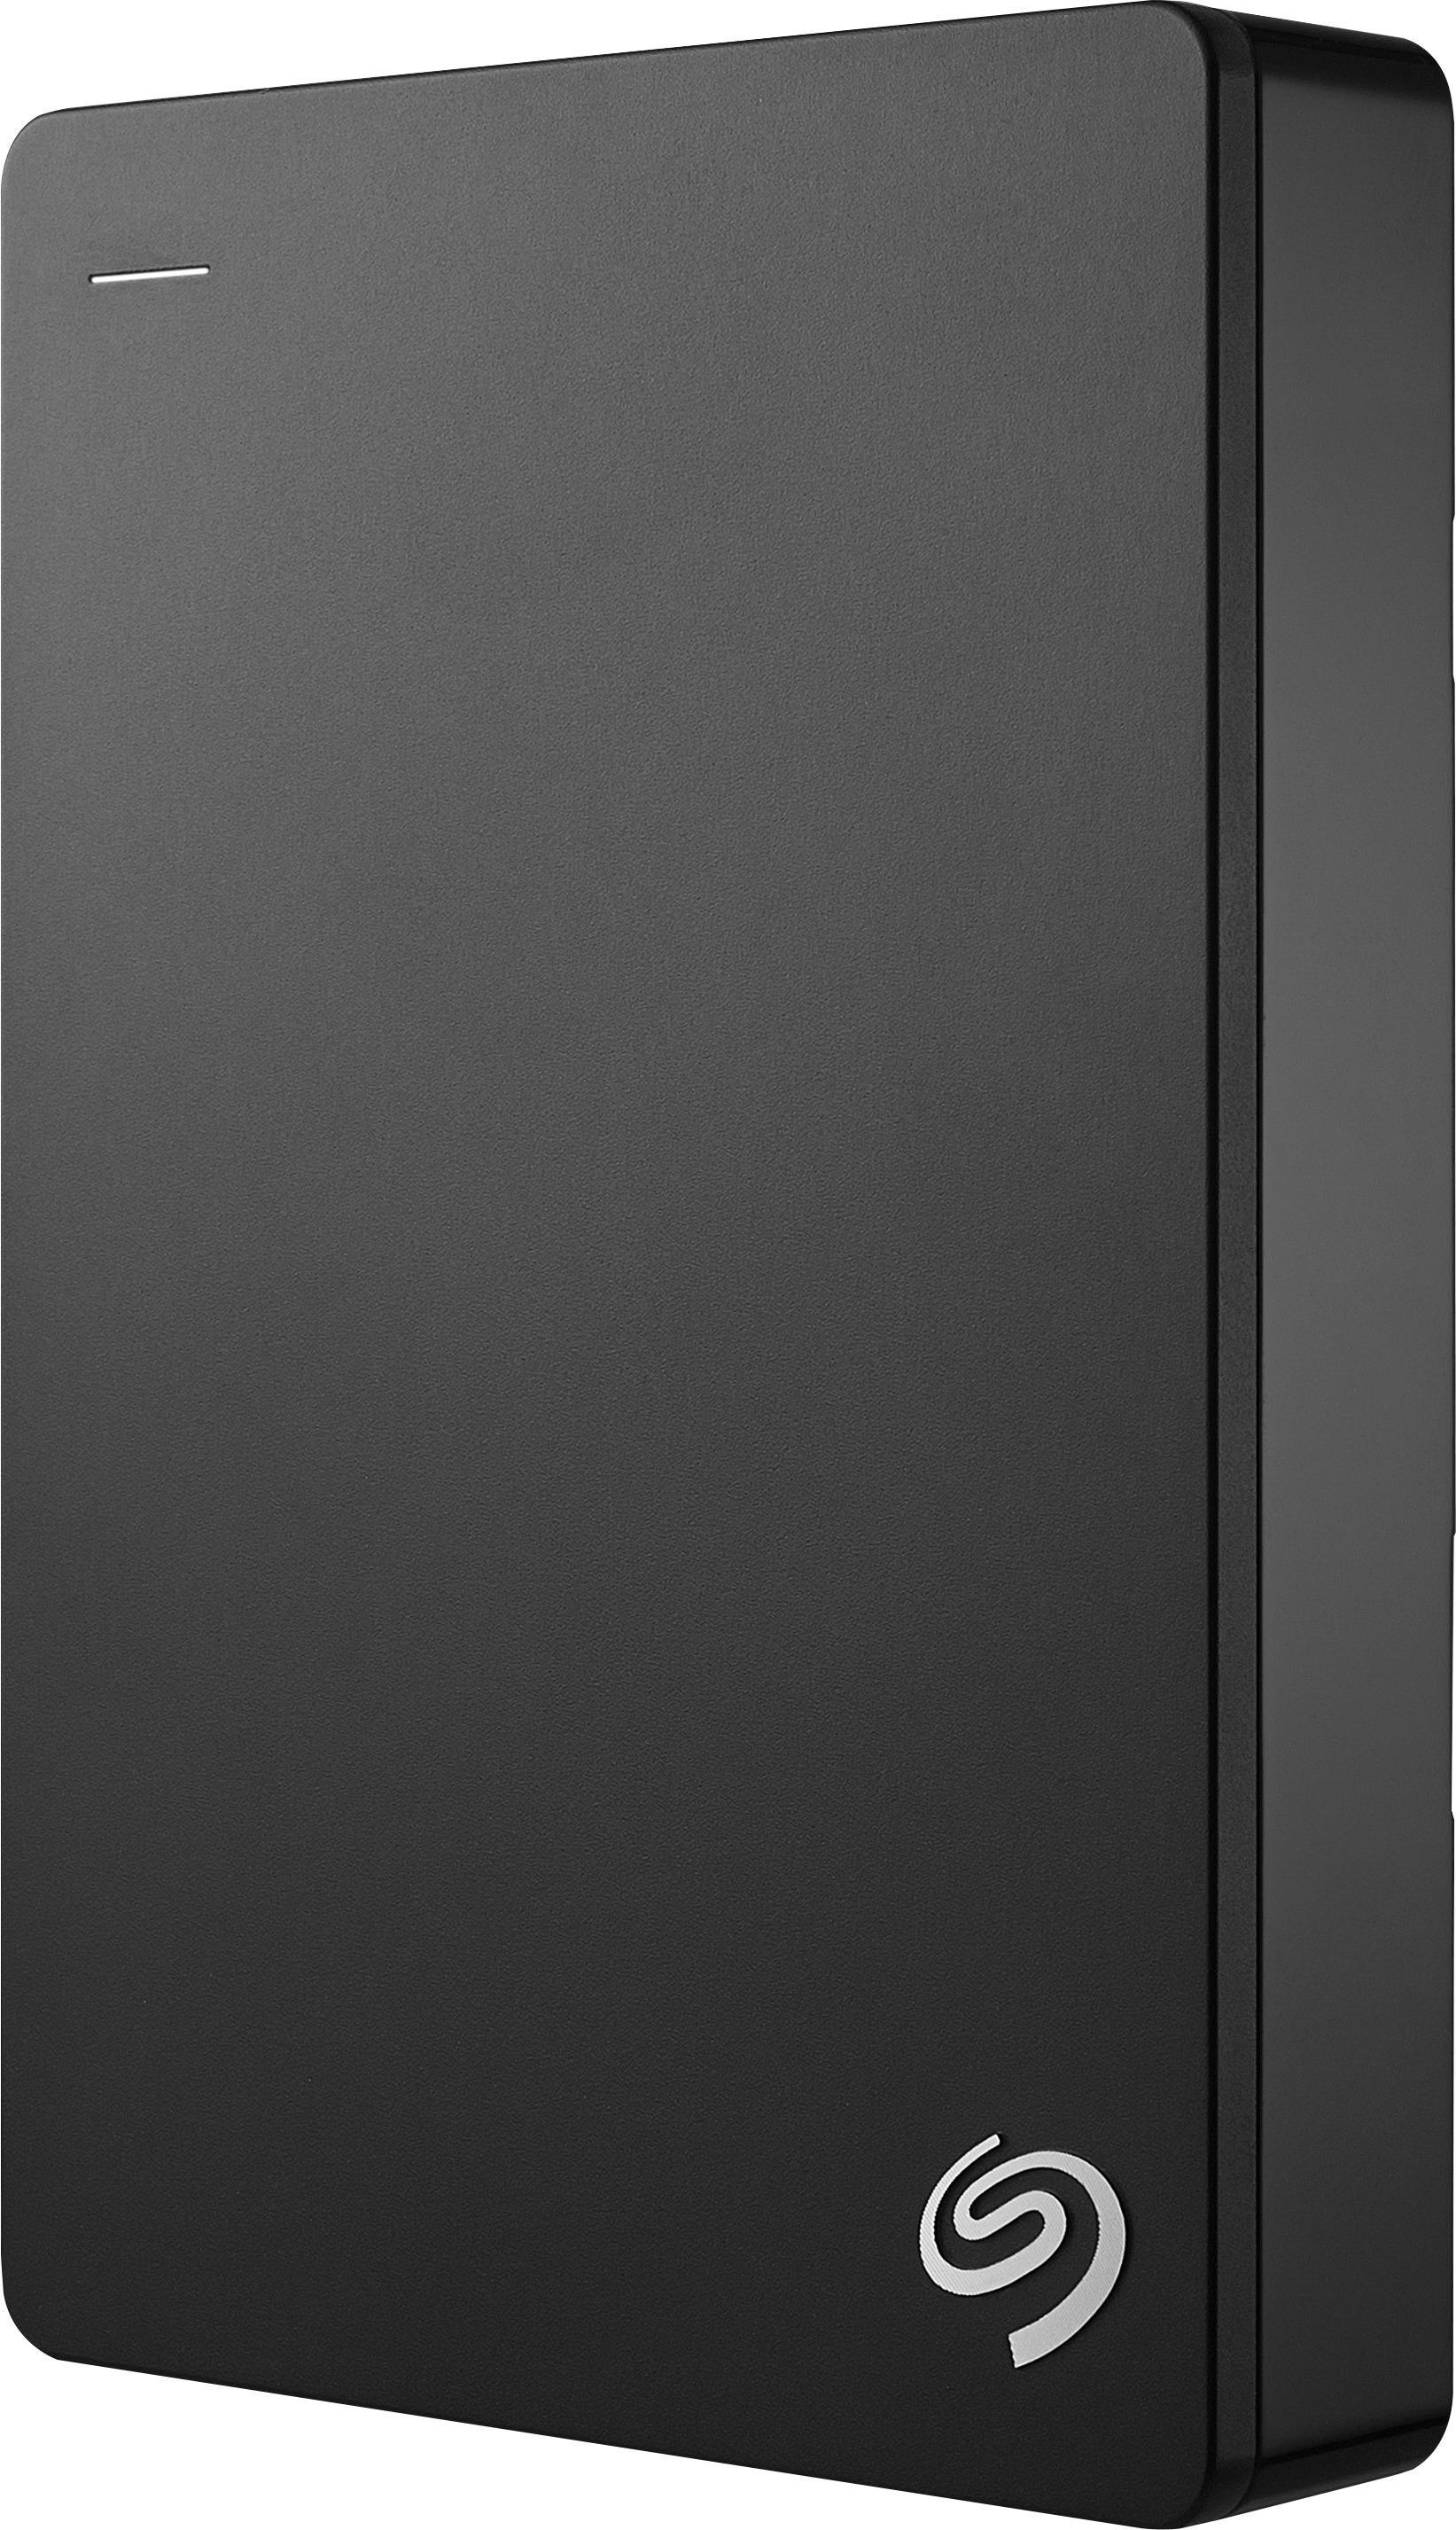 Seagate - Backup Plus Slim 4TB External USB 3.0/2.0 Portable Hard Drive - Black